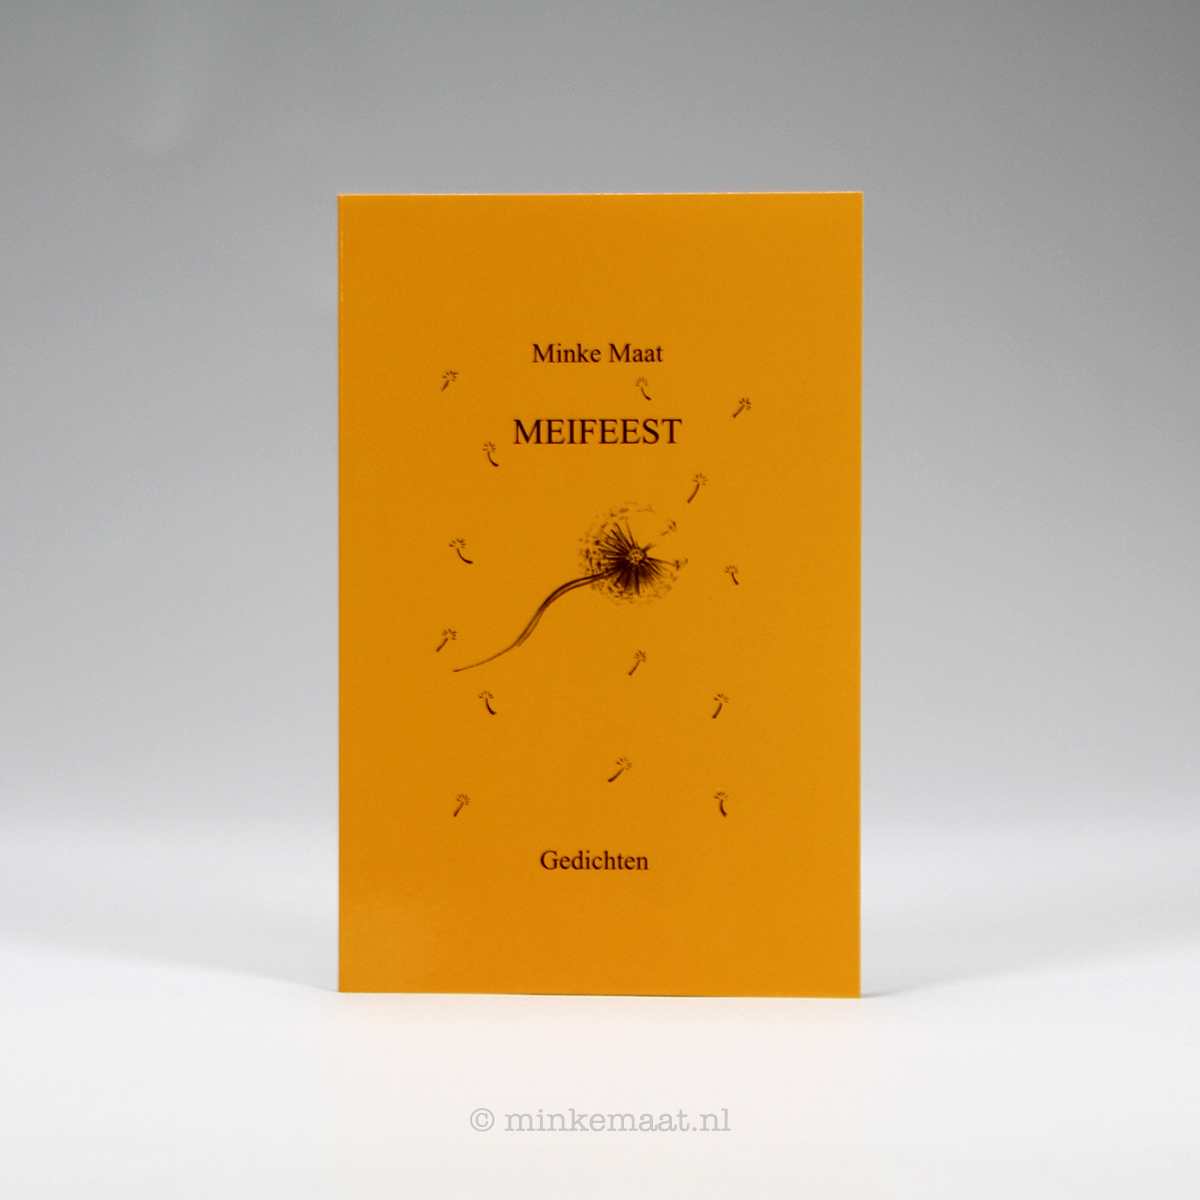 Boek Meifeest - Minke Maat